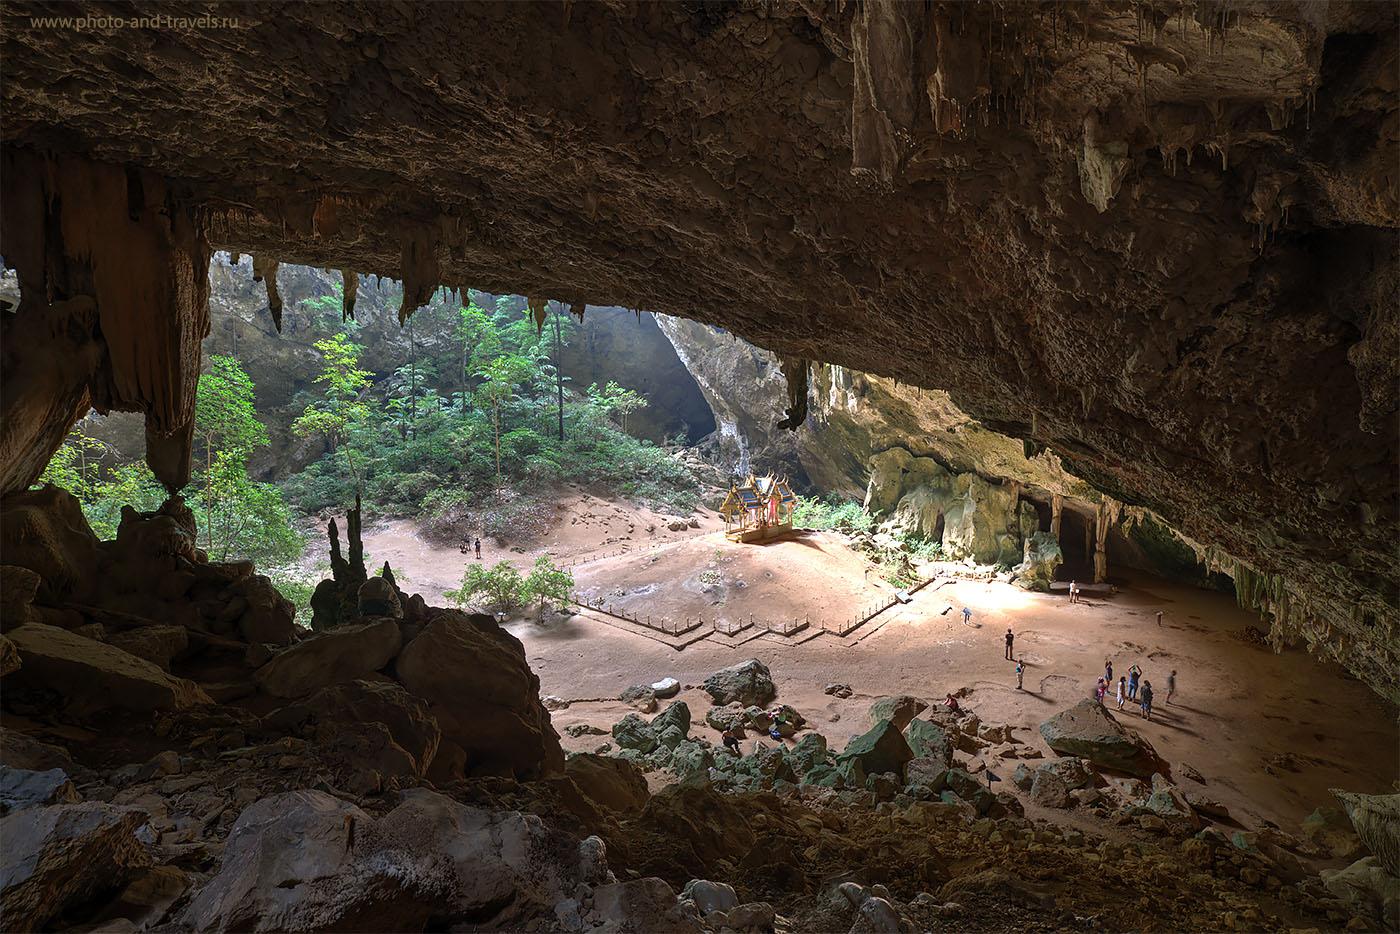 Фотография 11. Величественная пещера Пхрайя Накхон (Praya Nakhon Cave) в Таиланде. HDR из трех кадров. Снято на зеркалку Nikon D610 со штатива Sirui T-2204X. Объектив Samyang 14/2.8. Параметры съемки: 1/1.7 сек, -0.33 eV, приоритет диафрагмы, f/8, 14 мм, 100, отключена.